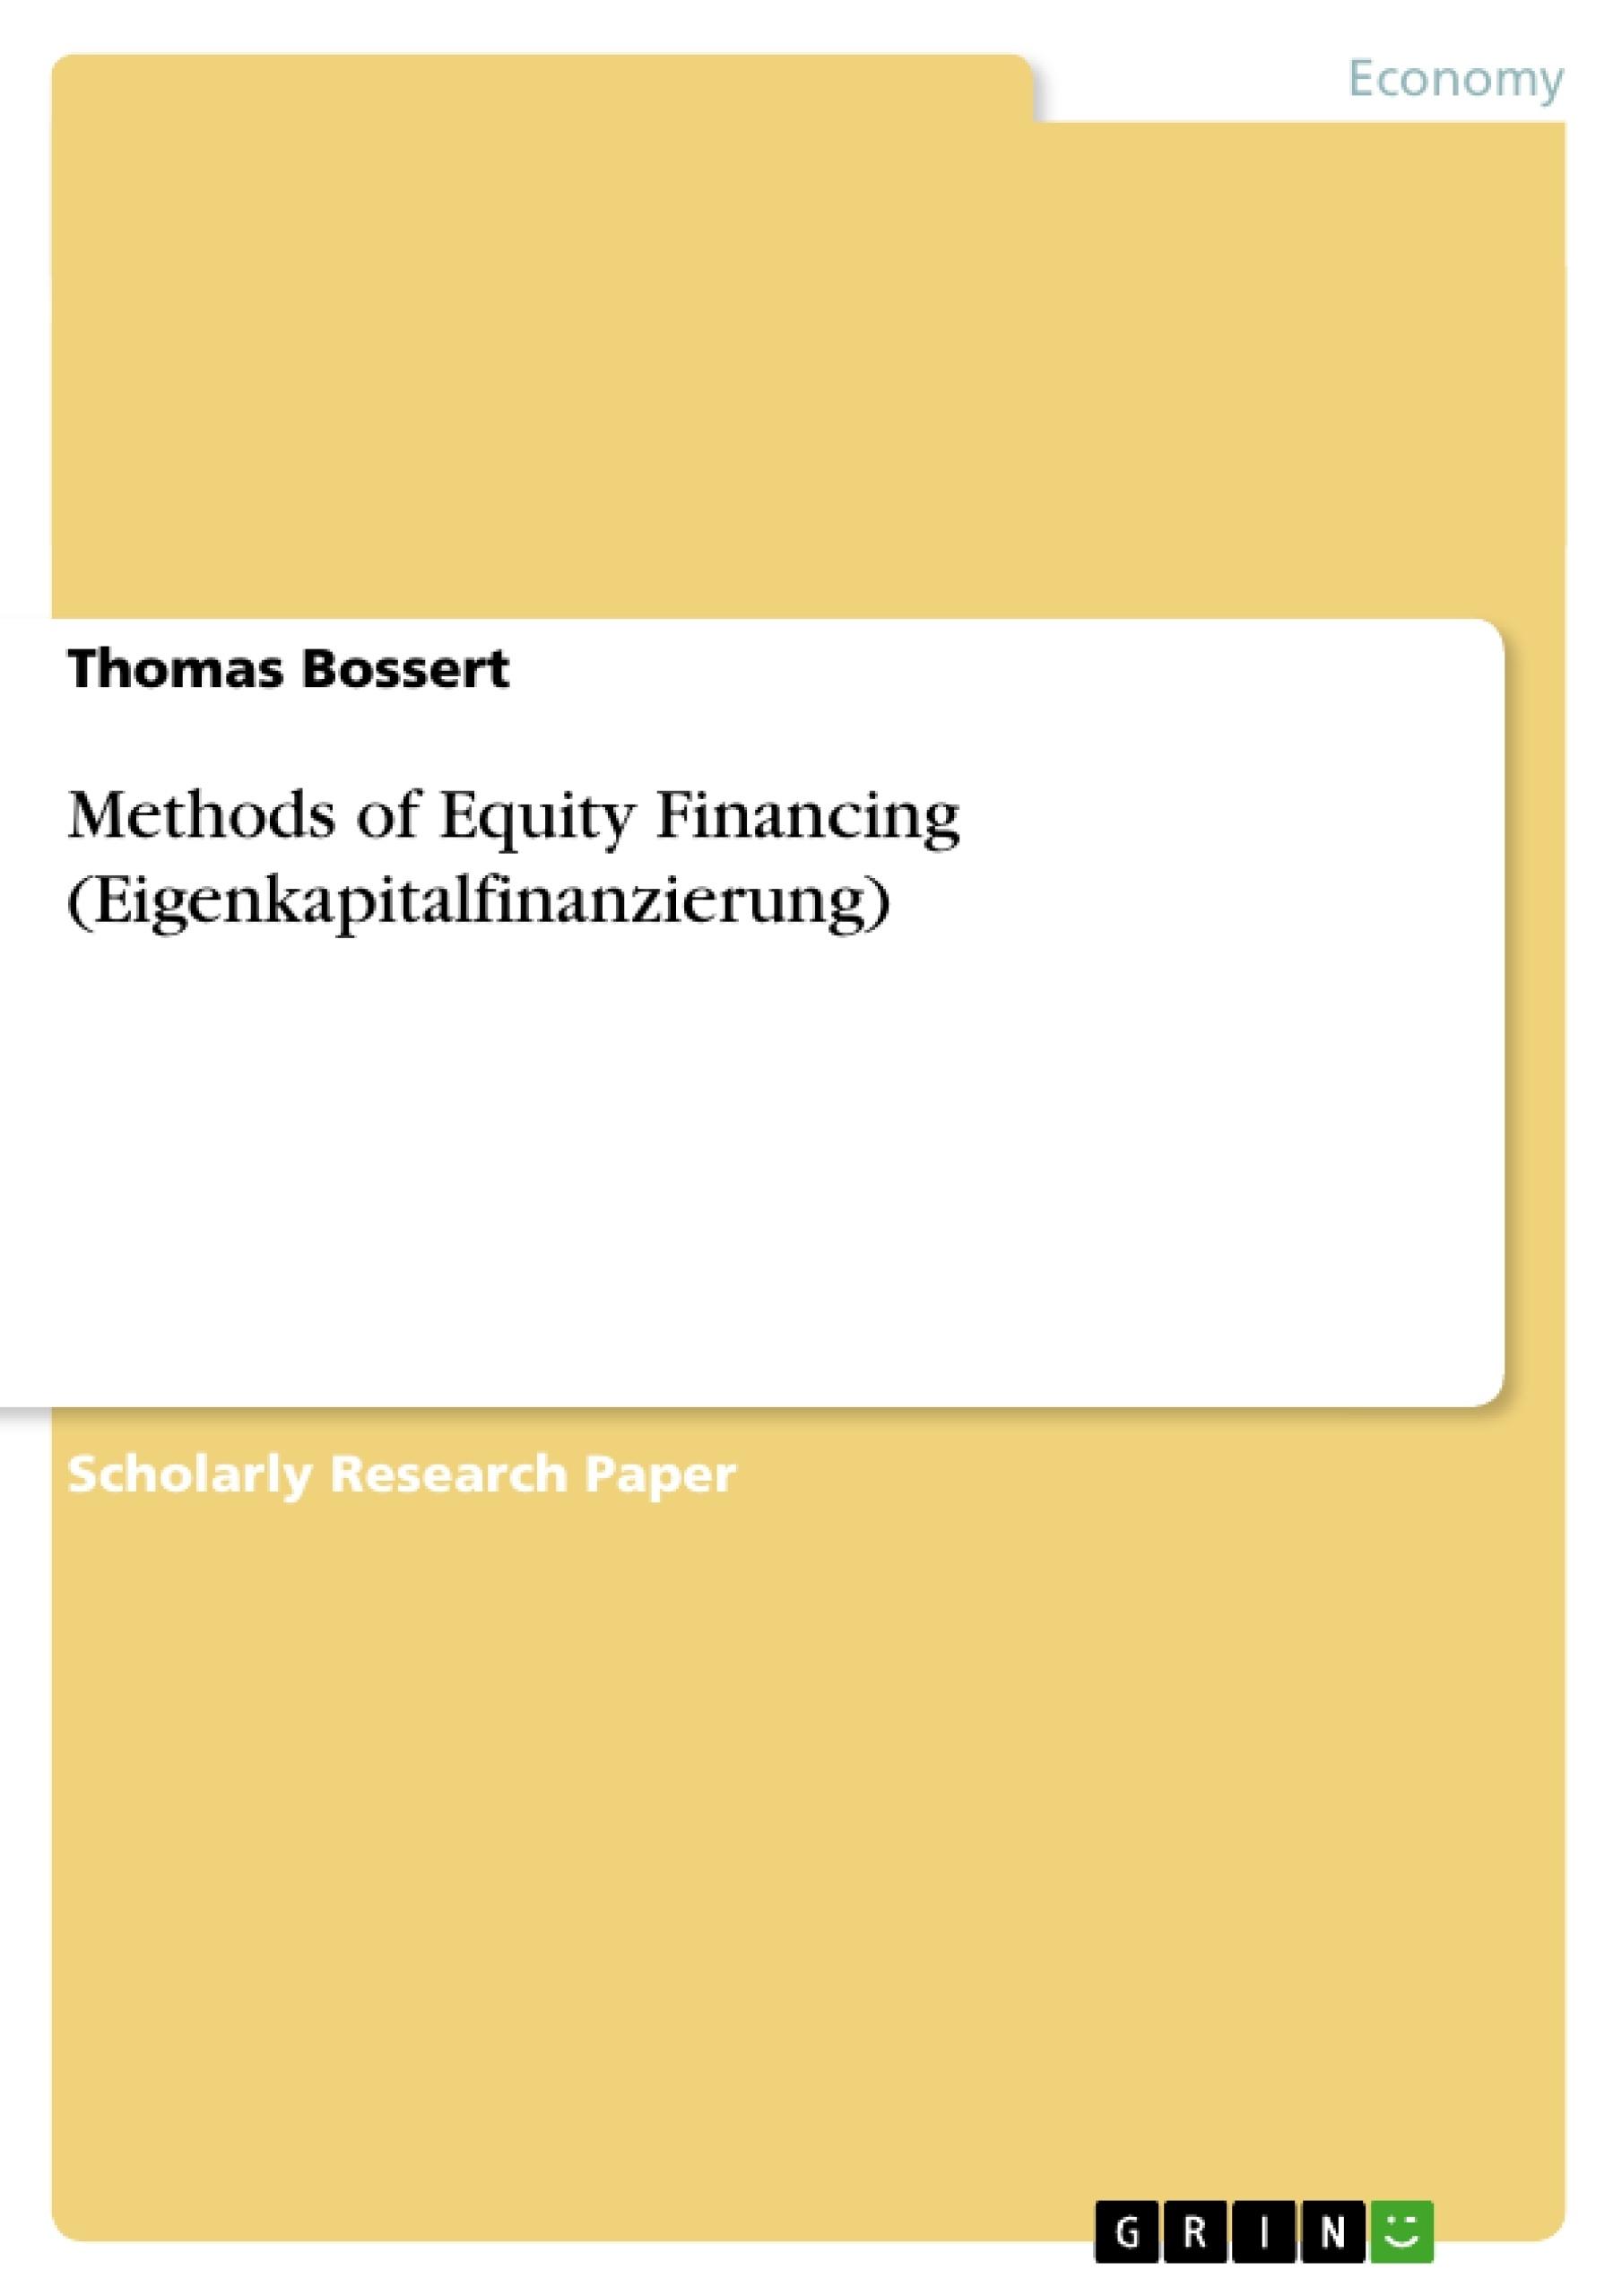 Title: Methods of Equity Financing (Eigenkapitalfinanzierung)